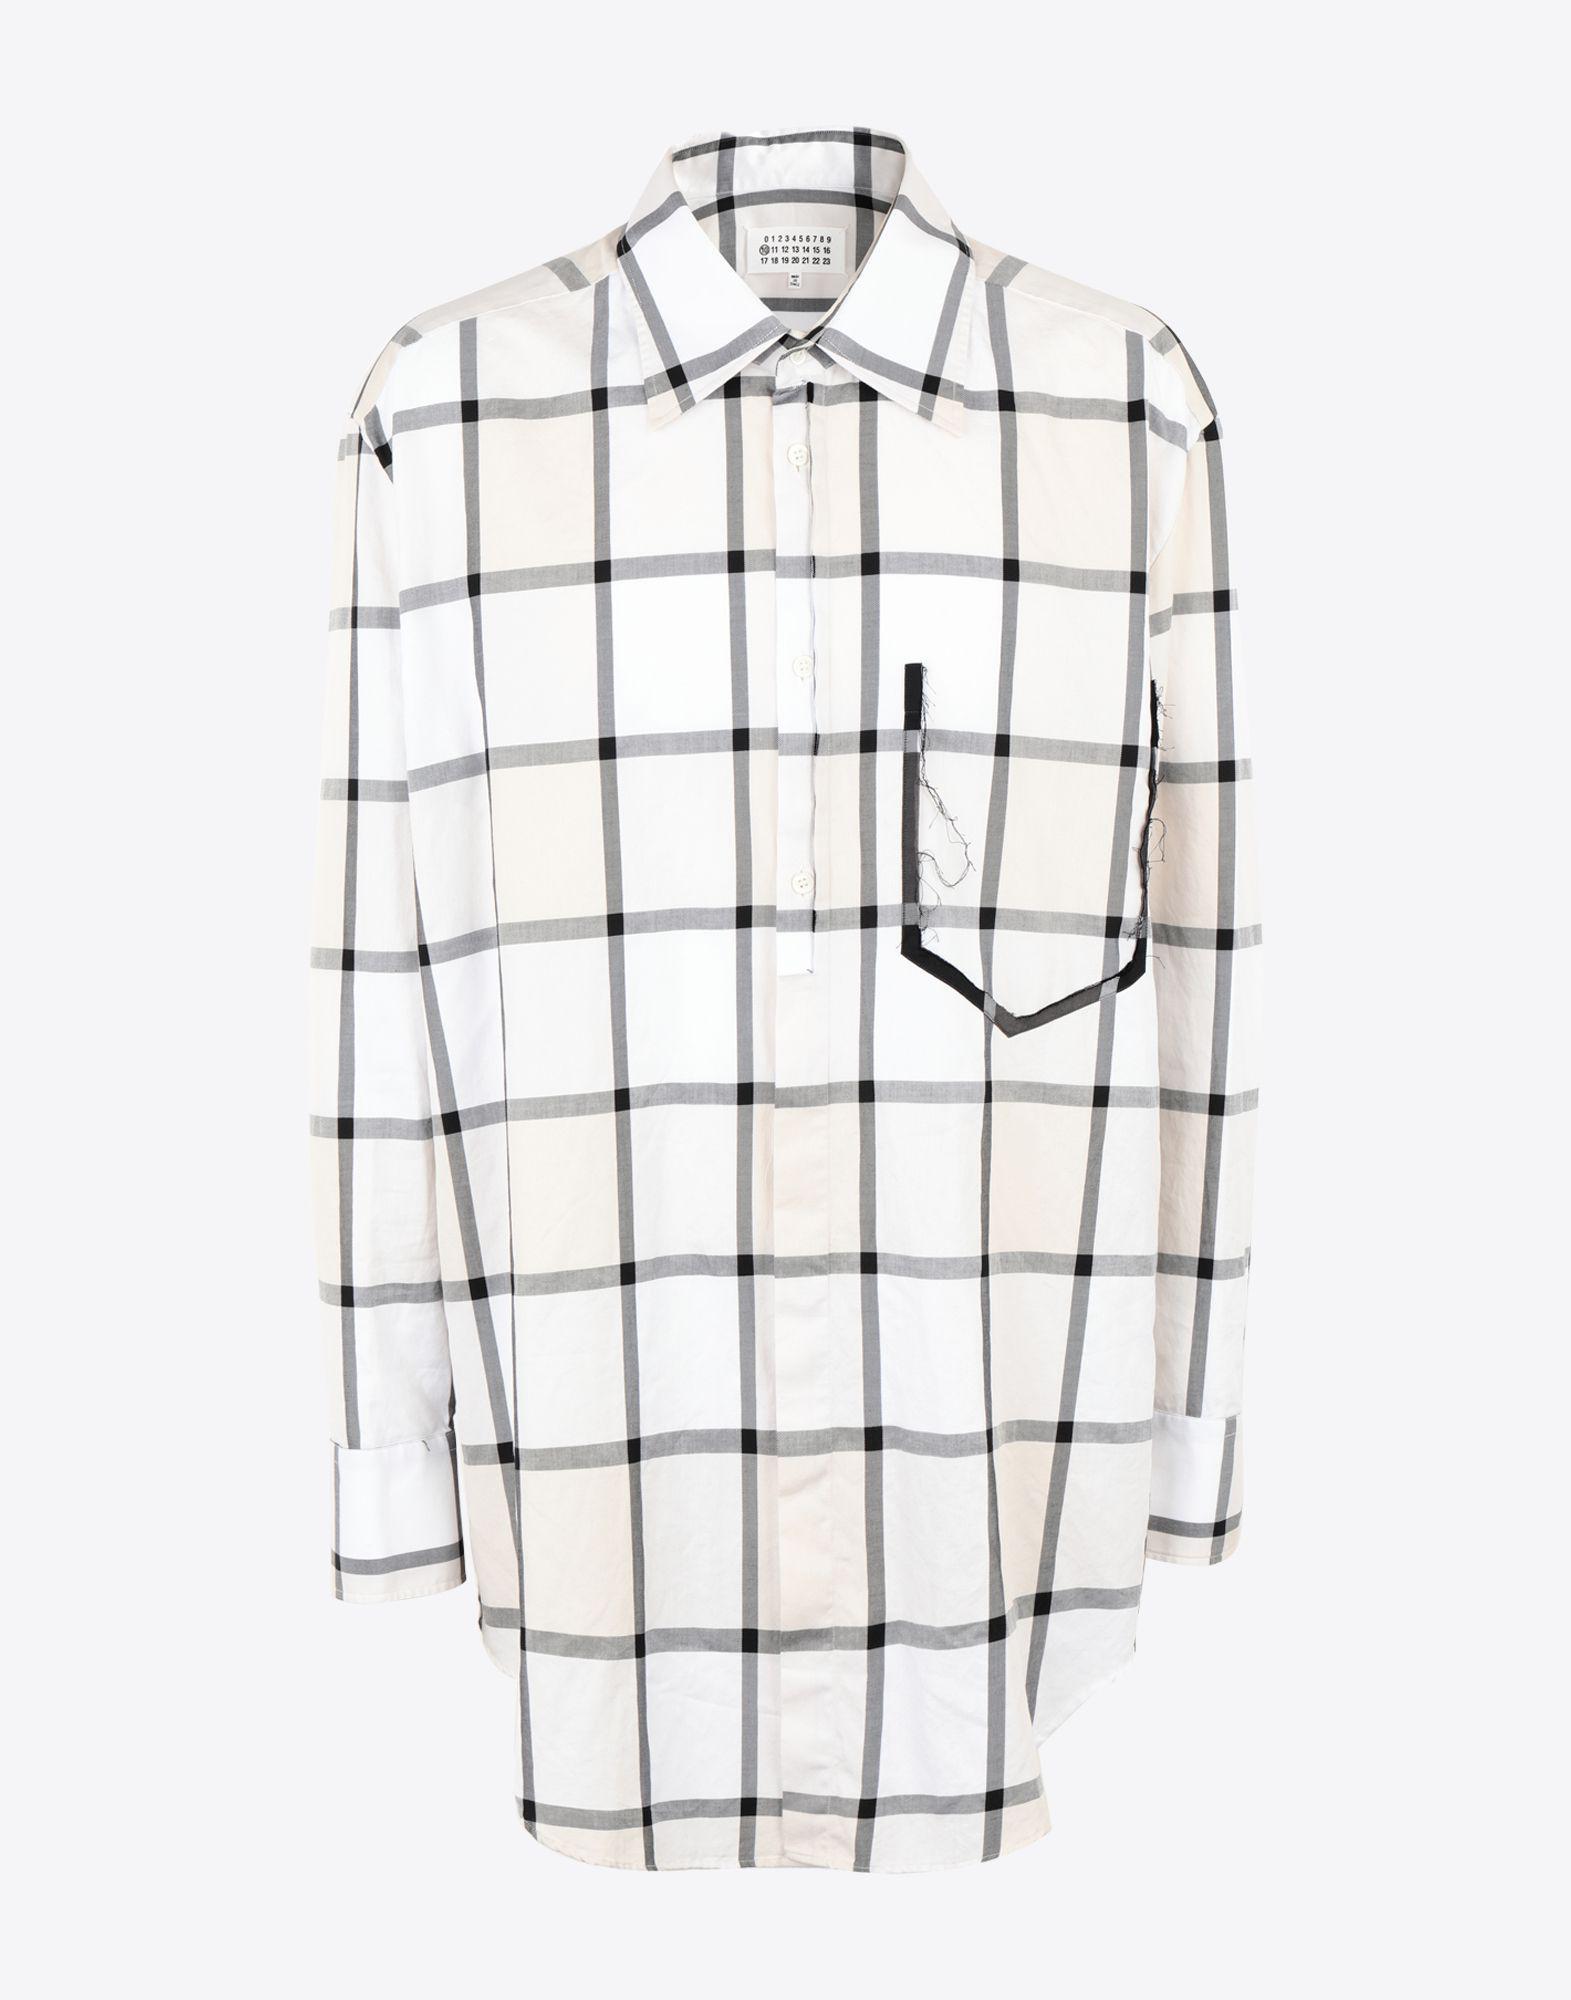 378f3db0e2 Lyst - Maison Margiela Décortiqué Pocket Check Shirt in White for Men